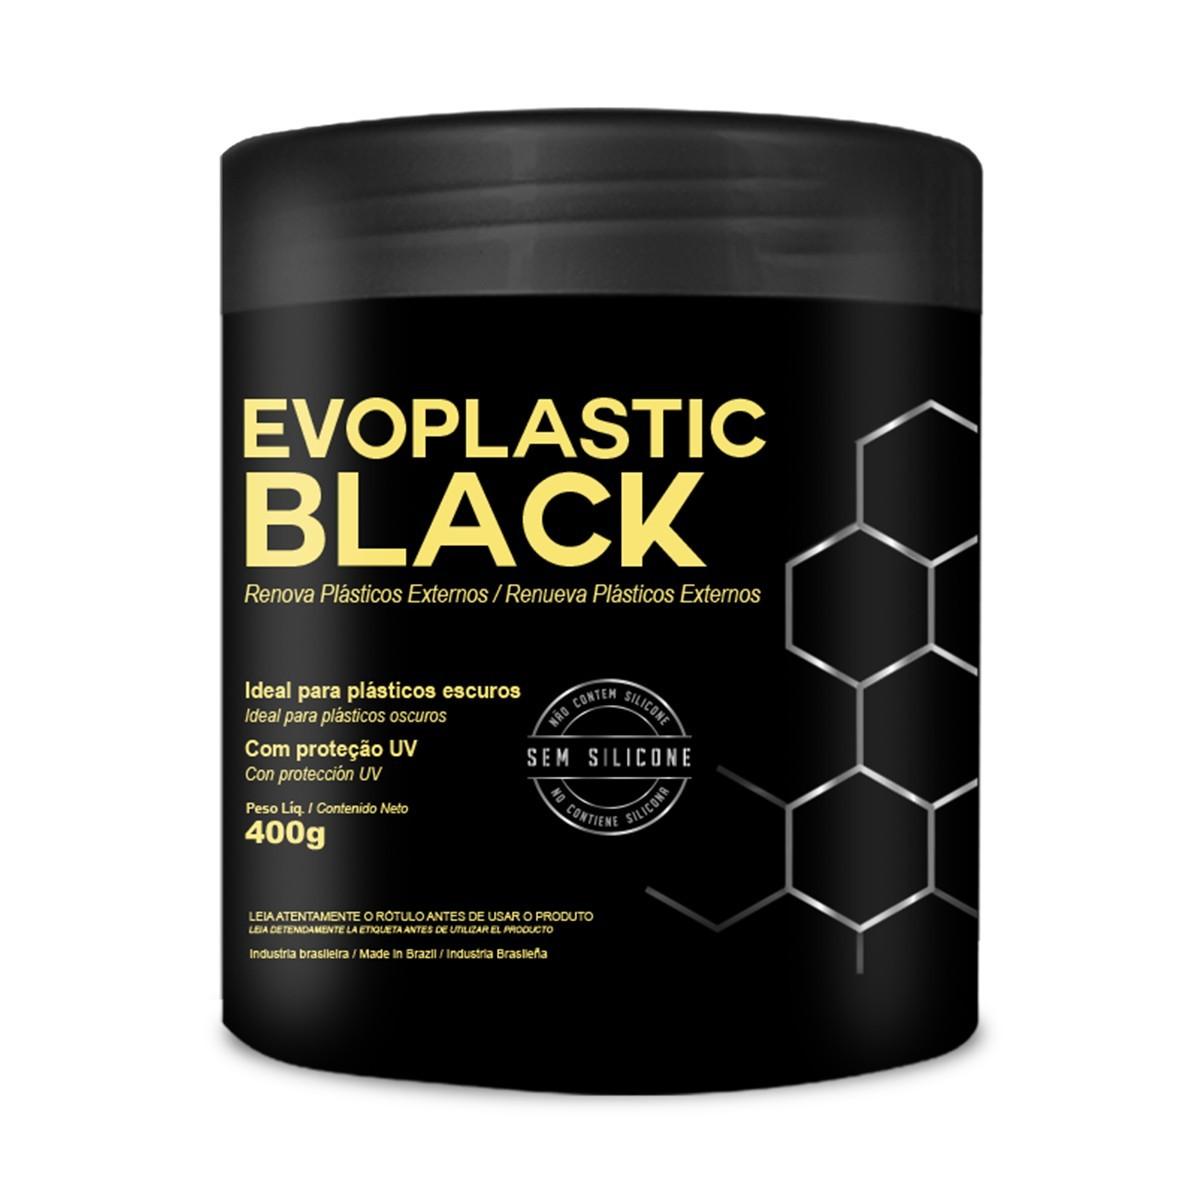 Renova Plásticos Externos Evoplastic Black 400g Evox